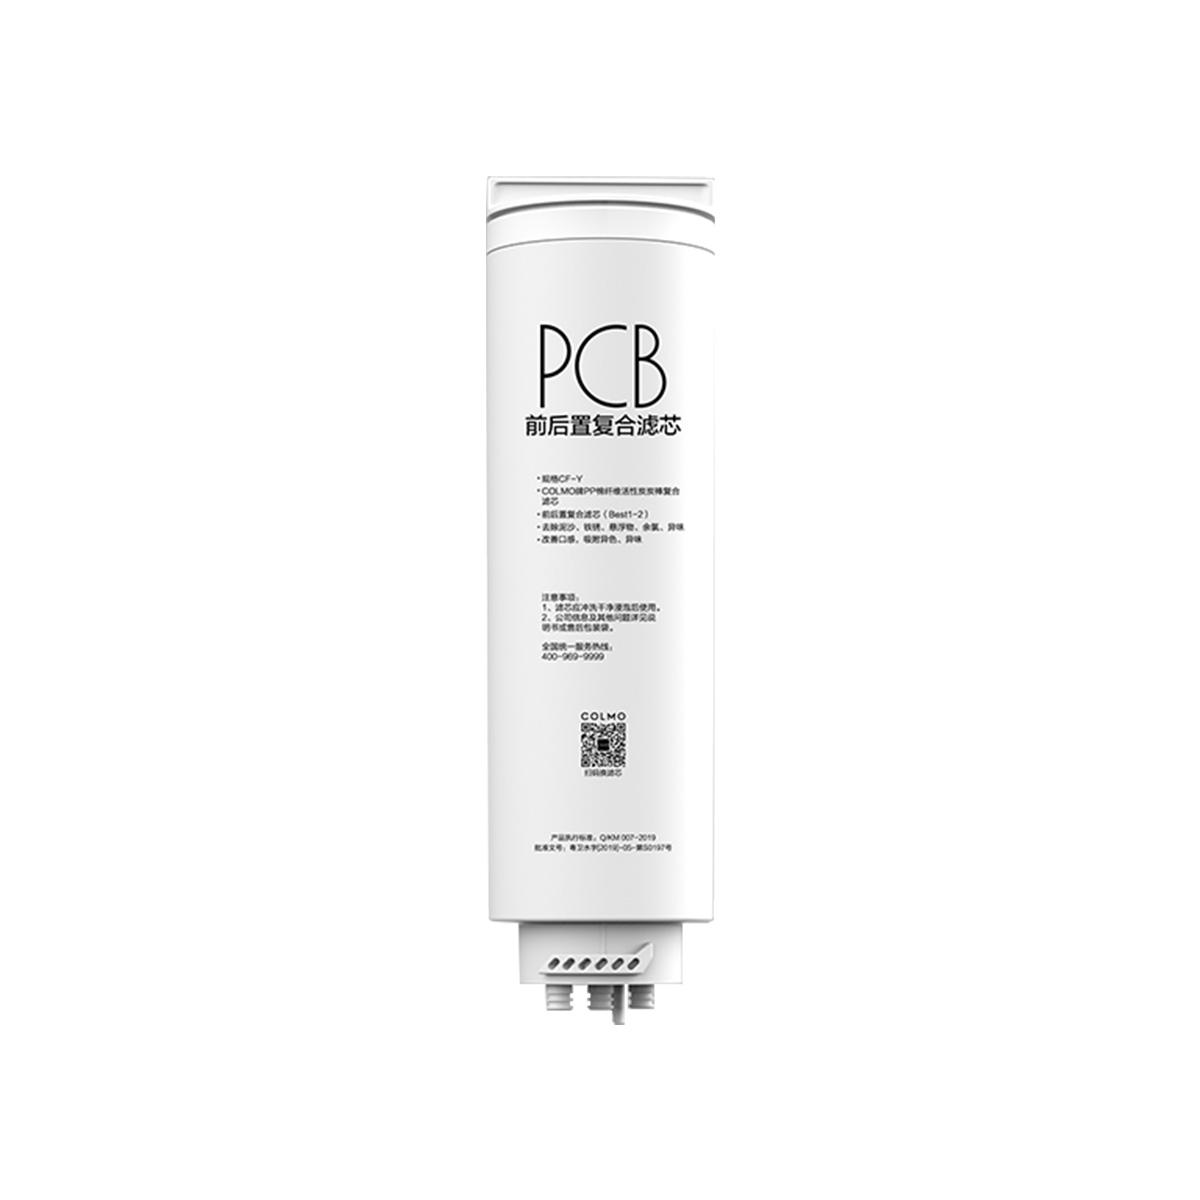 COLMO C1(PCB)-002净水机滤芯 说明书.pdf